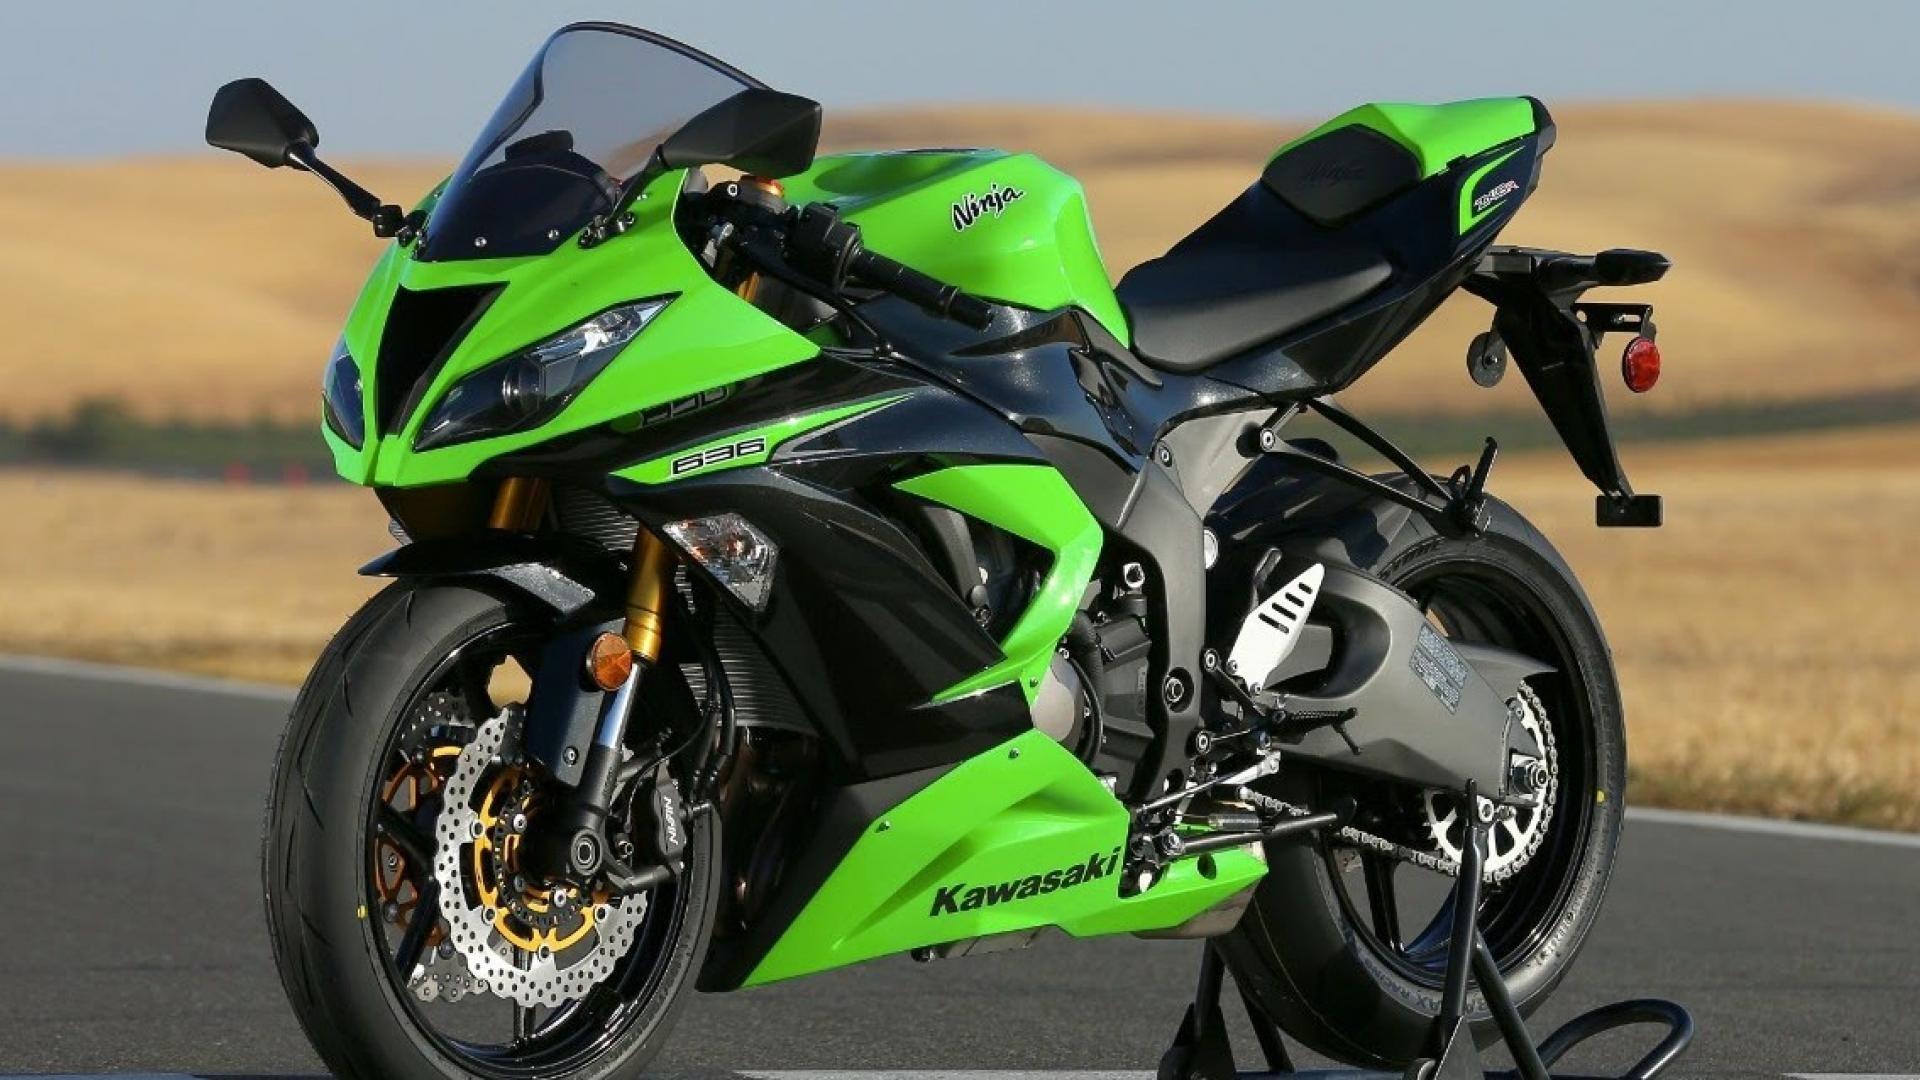 Kawasaki_Ninja_ZX_6R_636_2019 Motosikletler